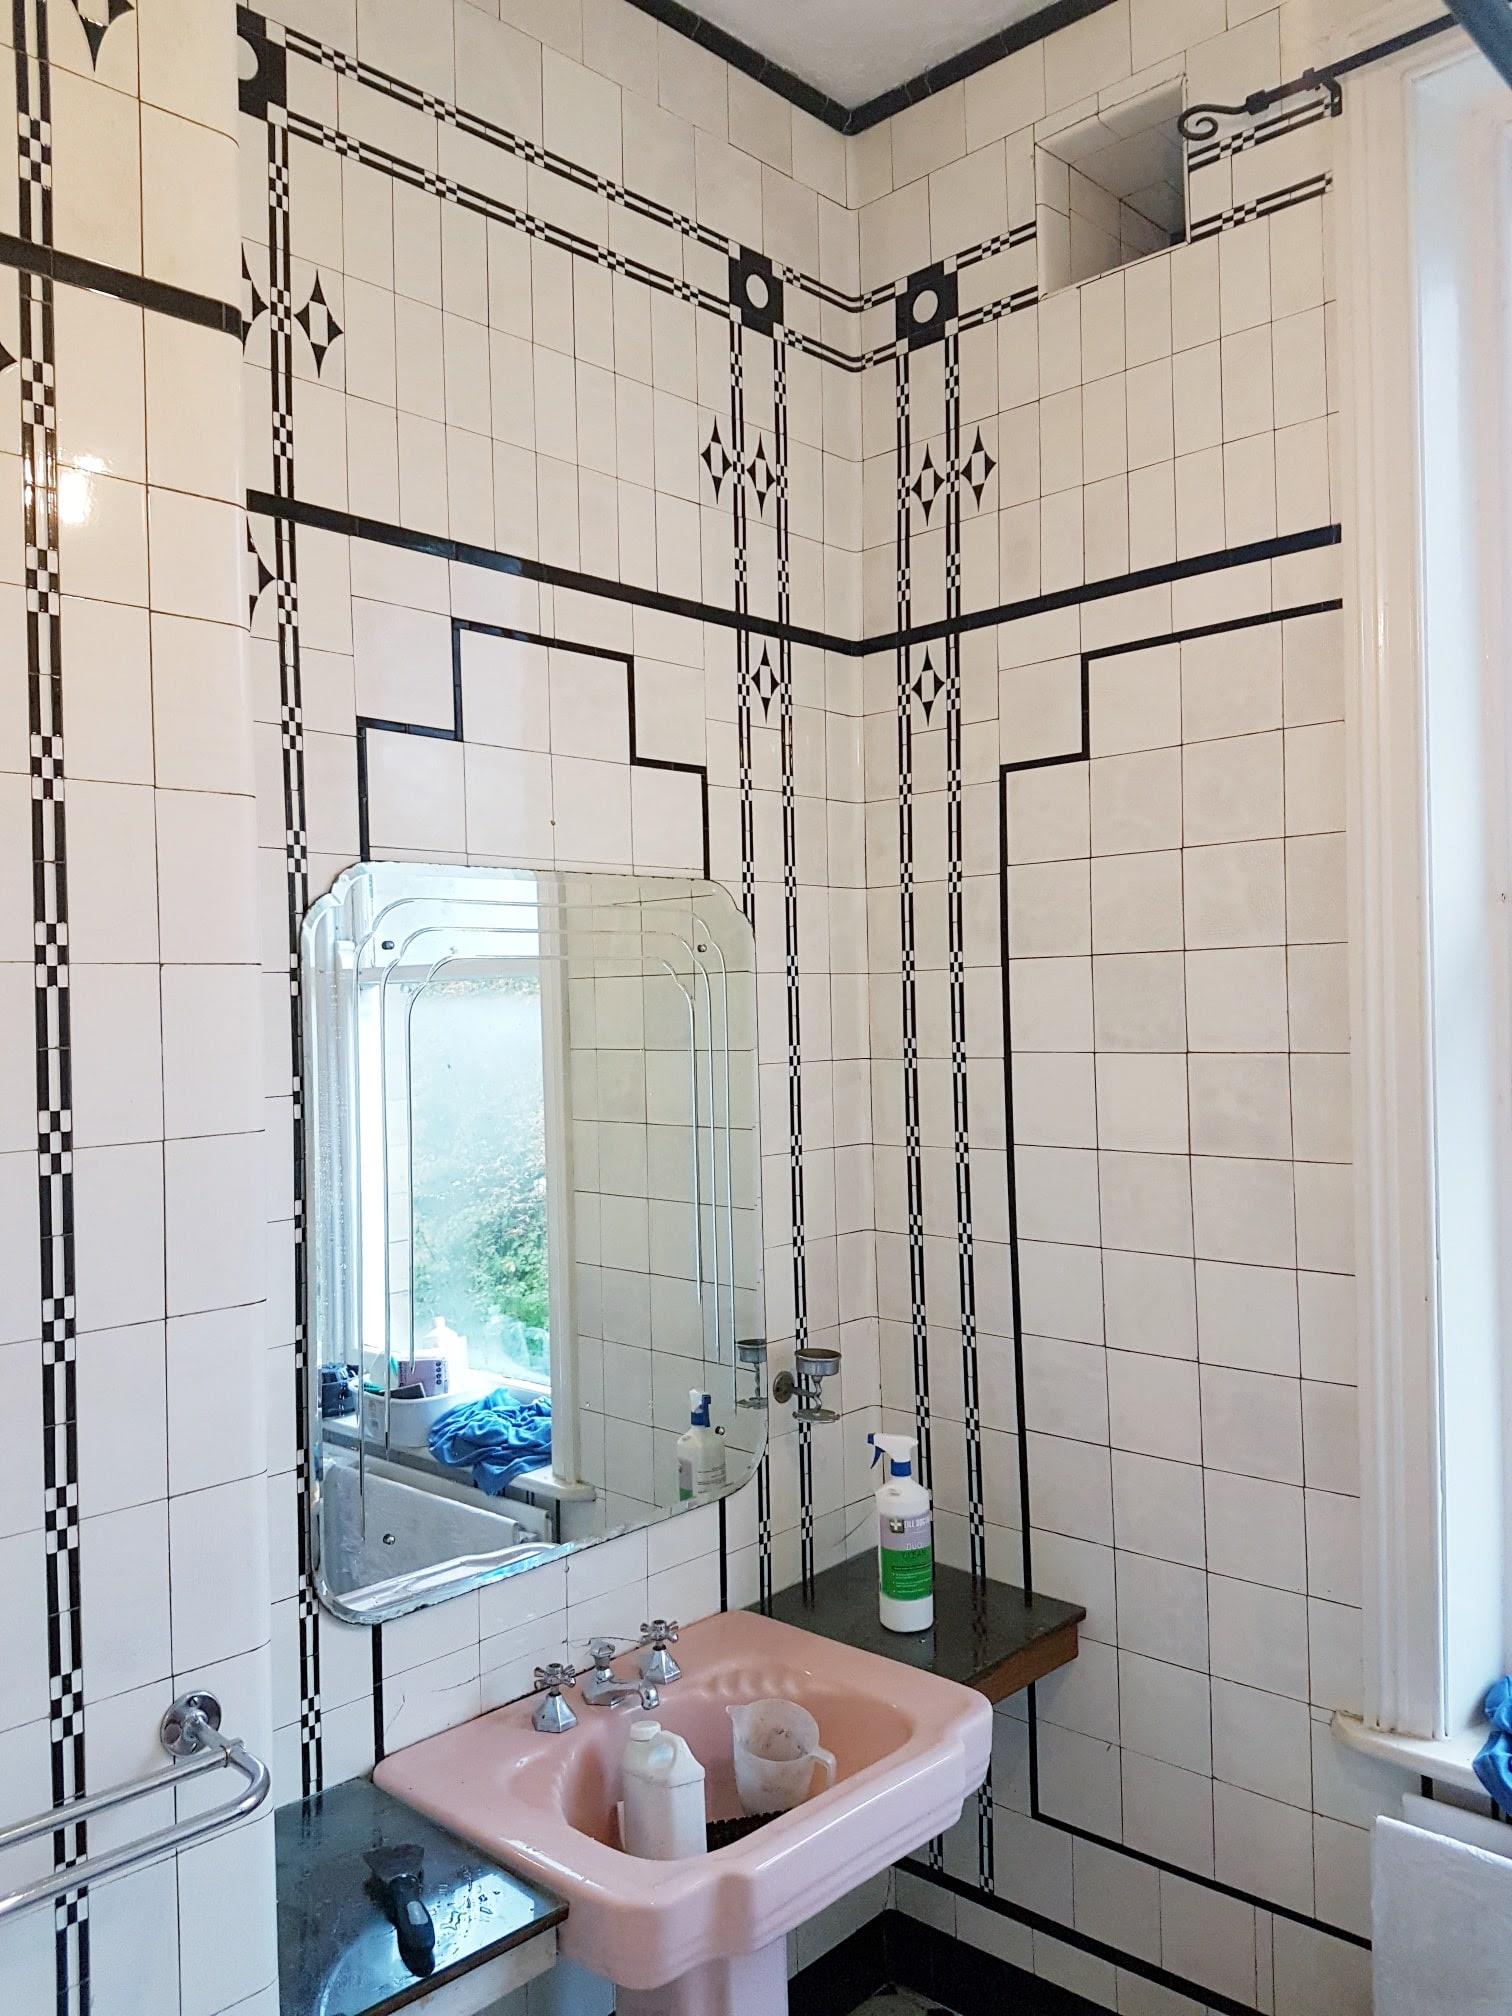 1940 Bathroom Tile Home Architec Ideas